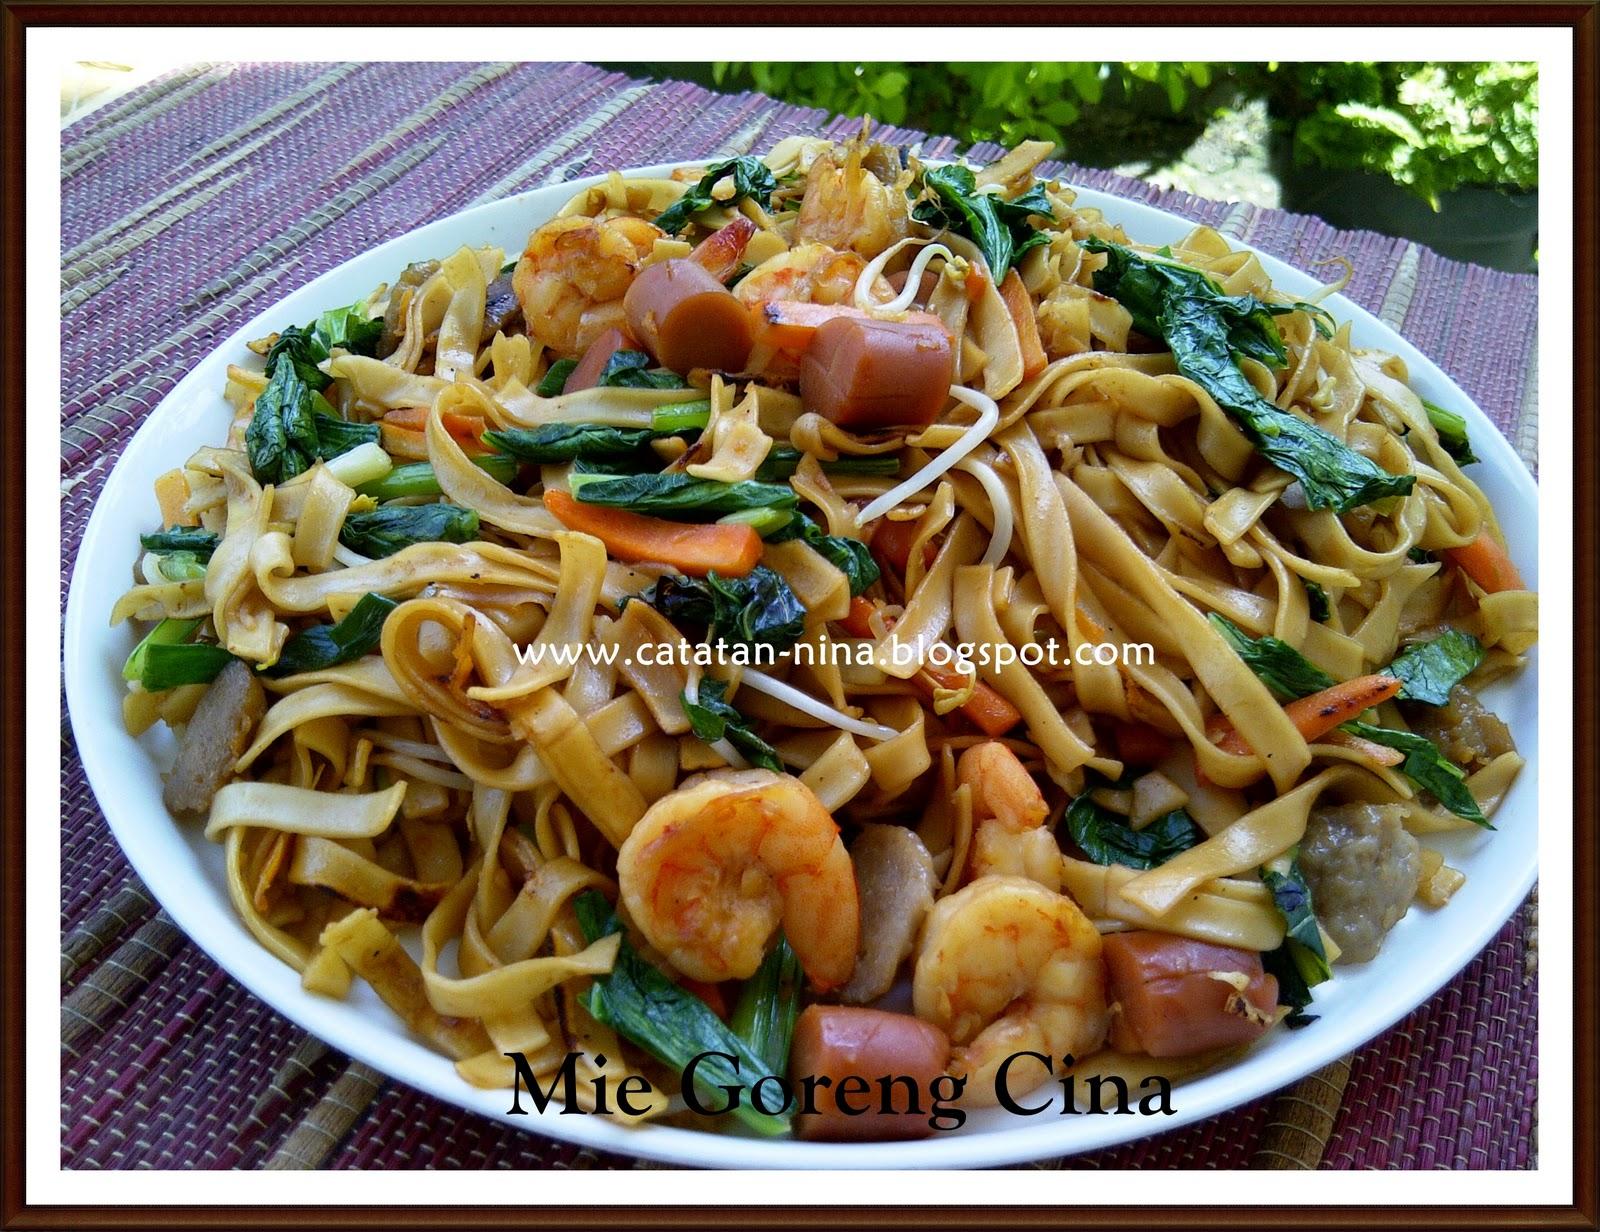 Mie goreng cina catatan nina aneka resep masakan rumah for Aja asian cuisine menu